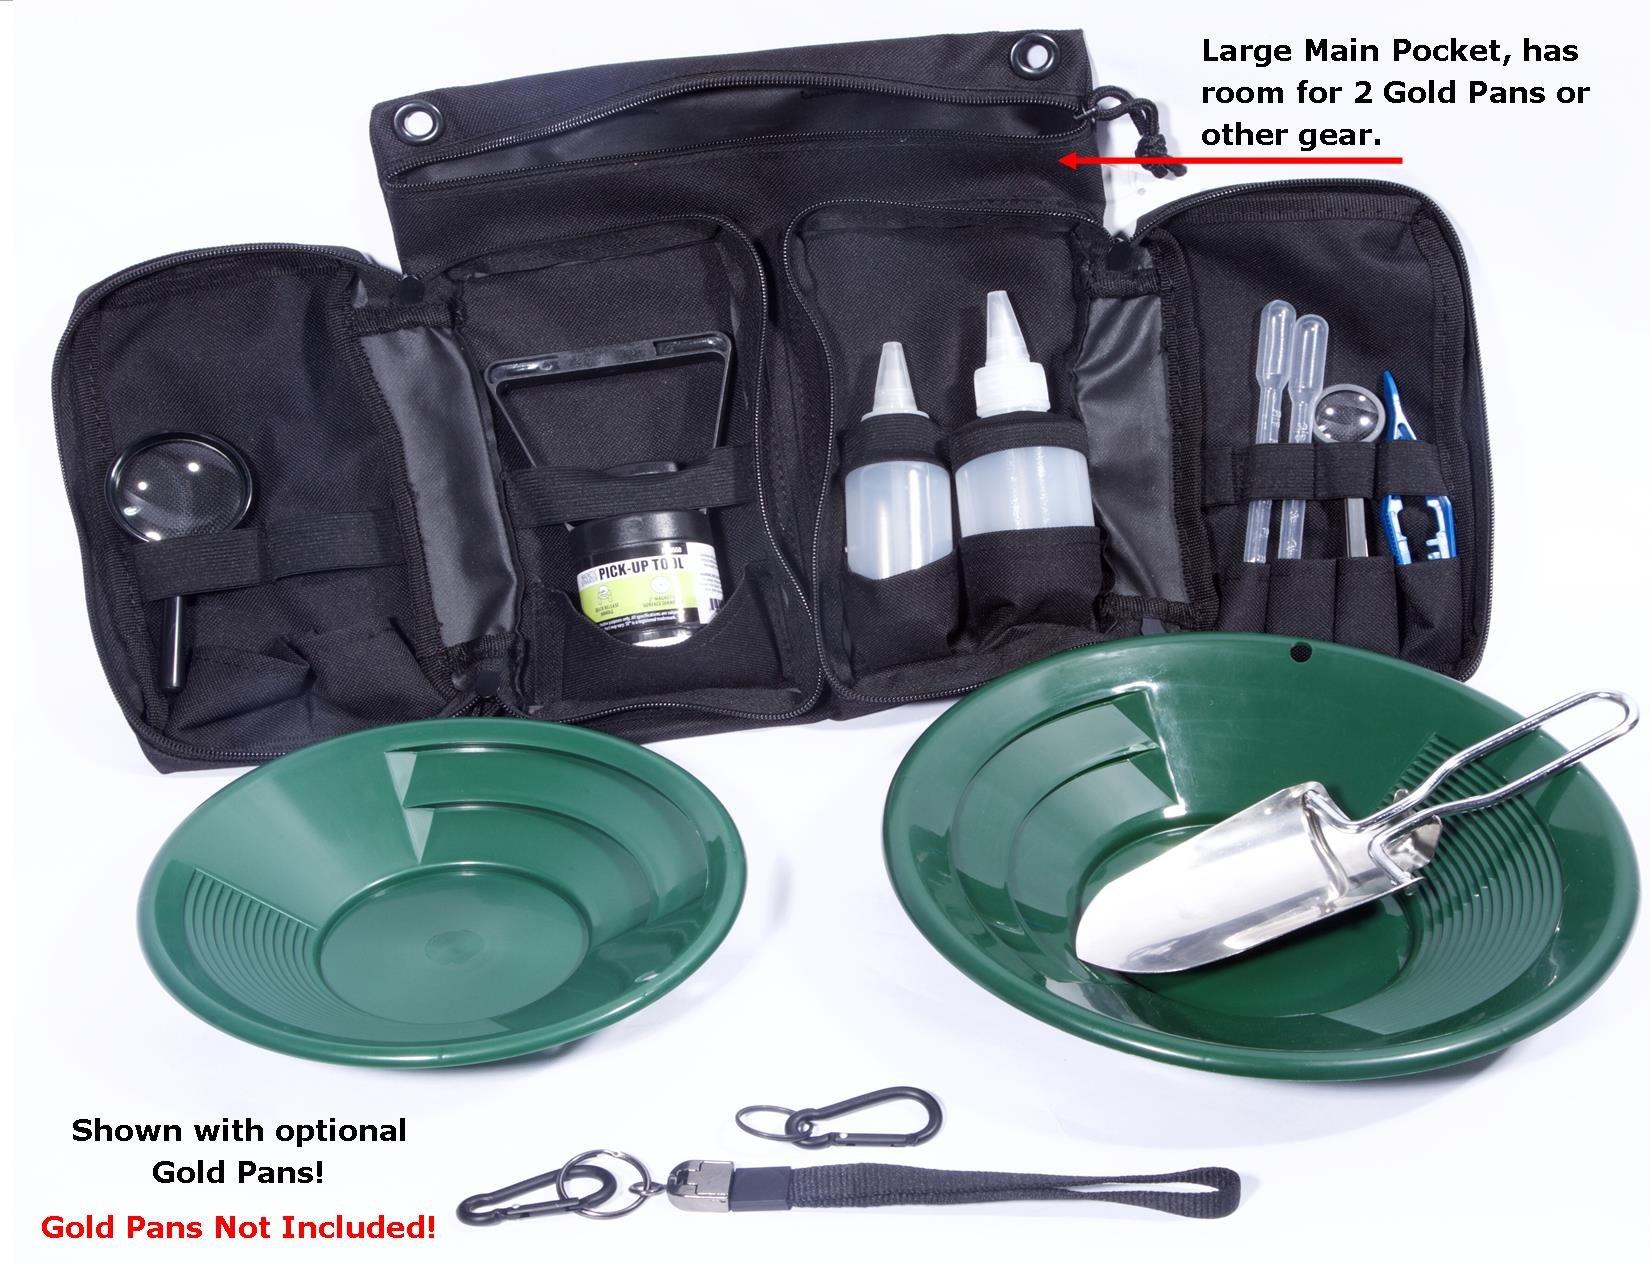 VAS 21 PC Blue Prospectors Gold Panning Pan Essentials Set Kit | Molle Bag | 2 Gold Pans | Adults | Kids | Beginners Too! | Equipment for Metal Detecting & Gold Panning (Blue Gold Pans)